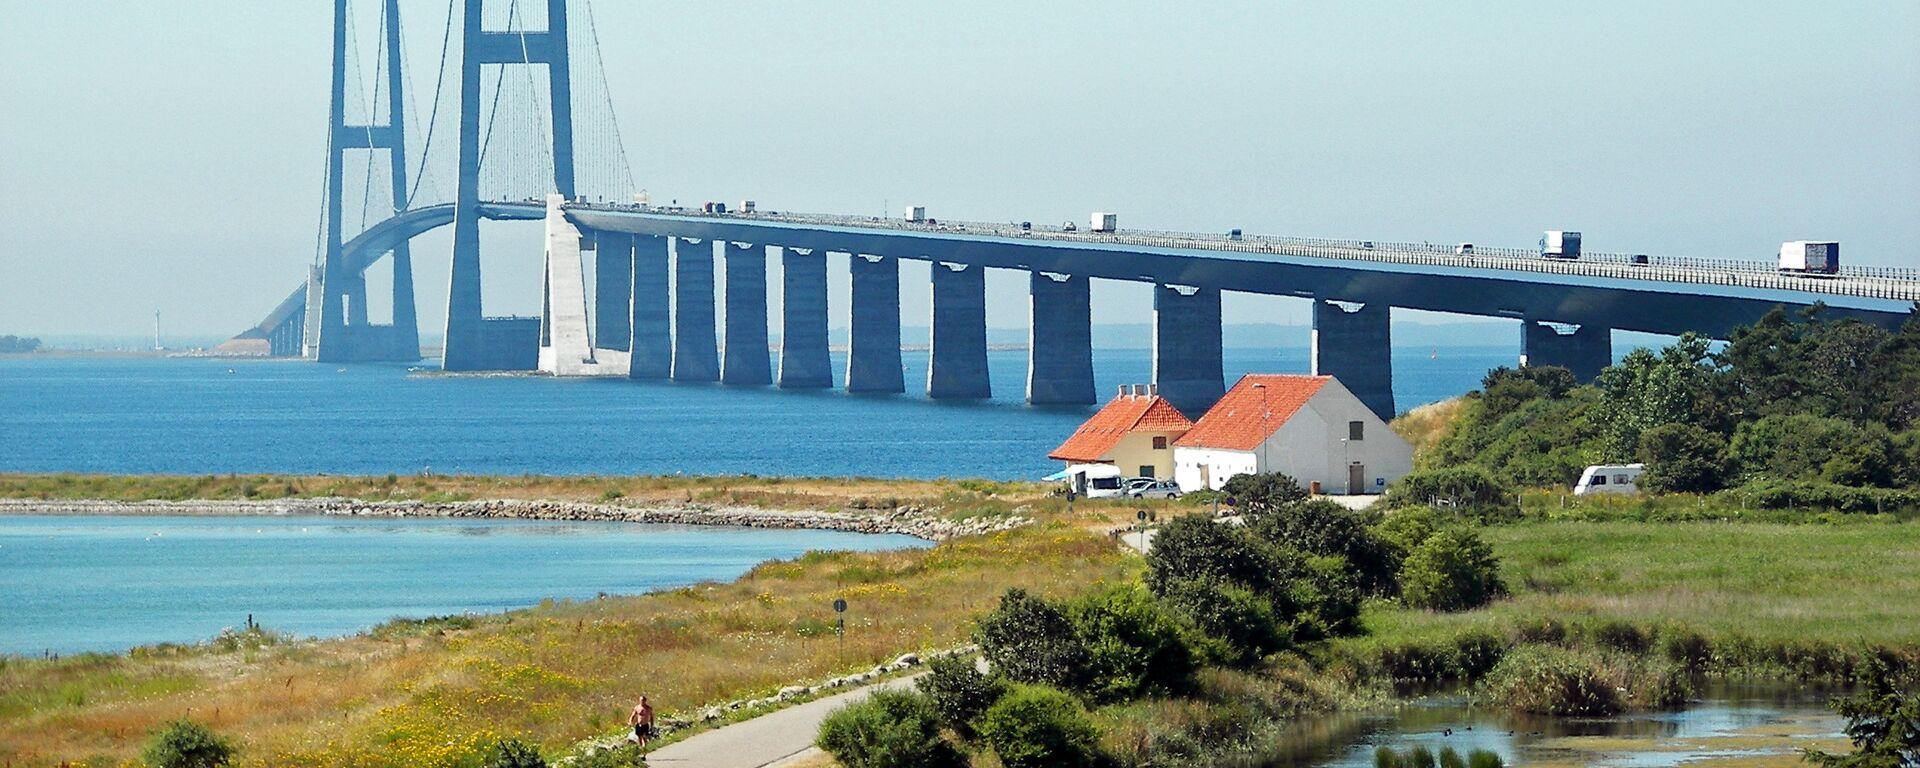 Il Ponte del Grande Belt, Danimarca - Sputnik Italia, 1920, 04.02.2021